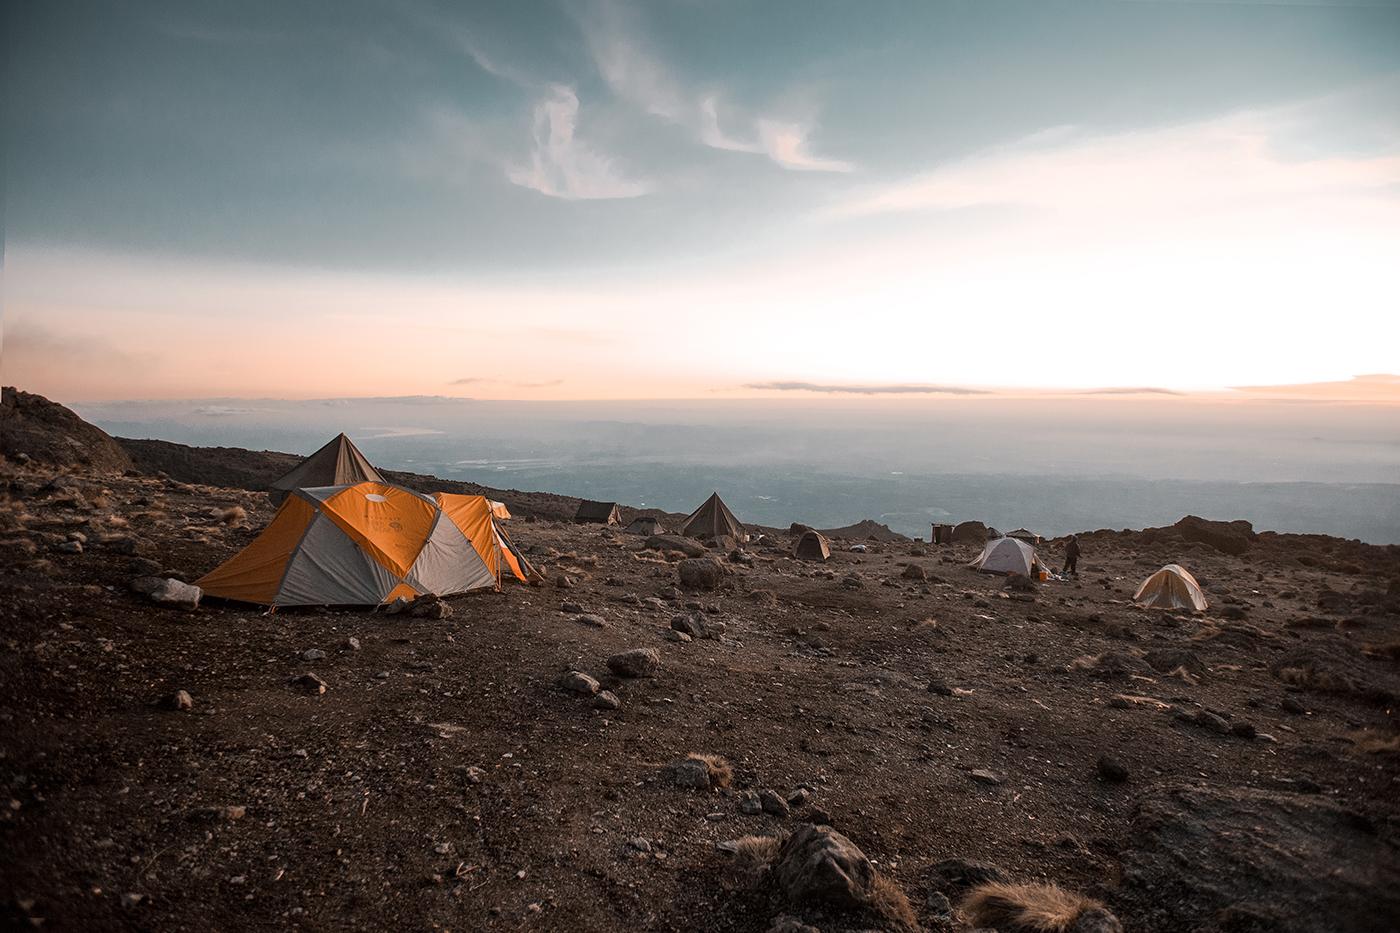 my-wanderlust-notes-sulla-cima-del-kilimanjaro-rifugio-mbui